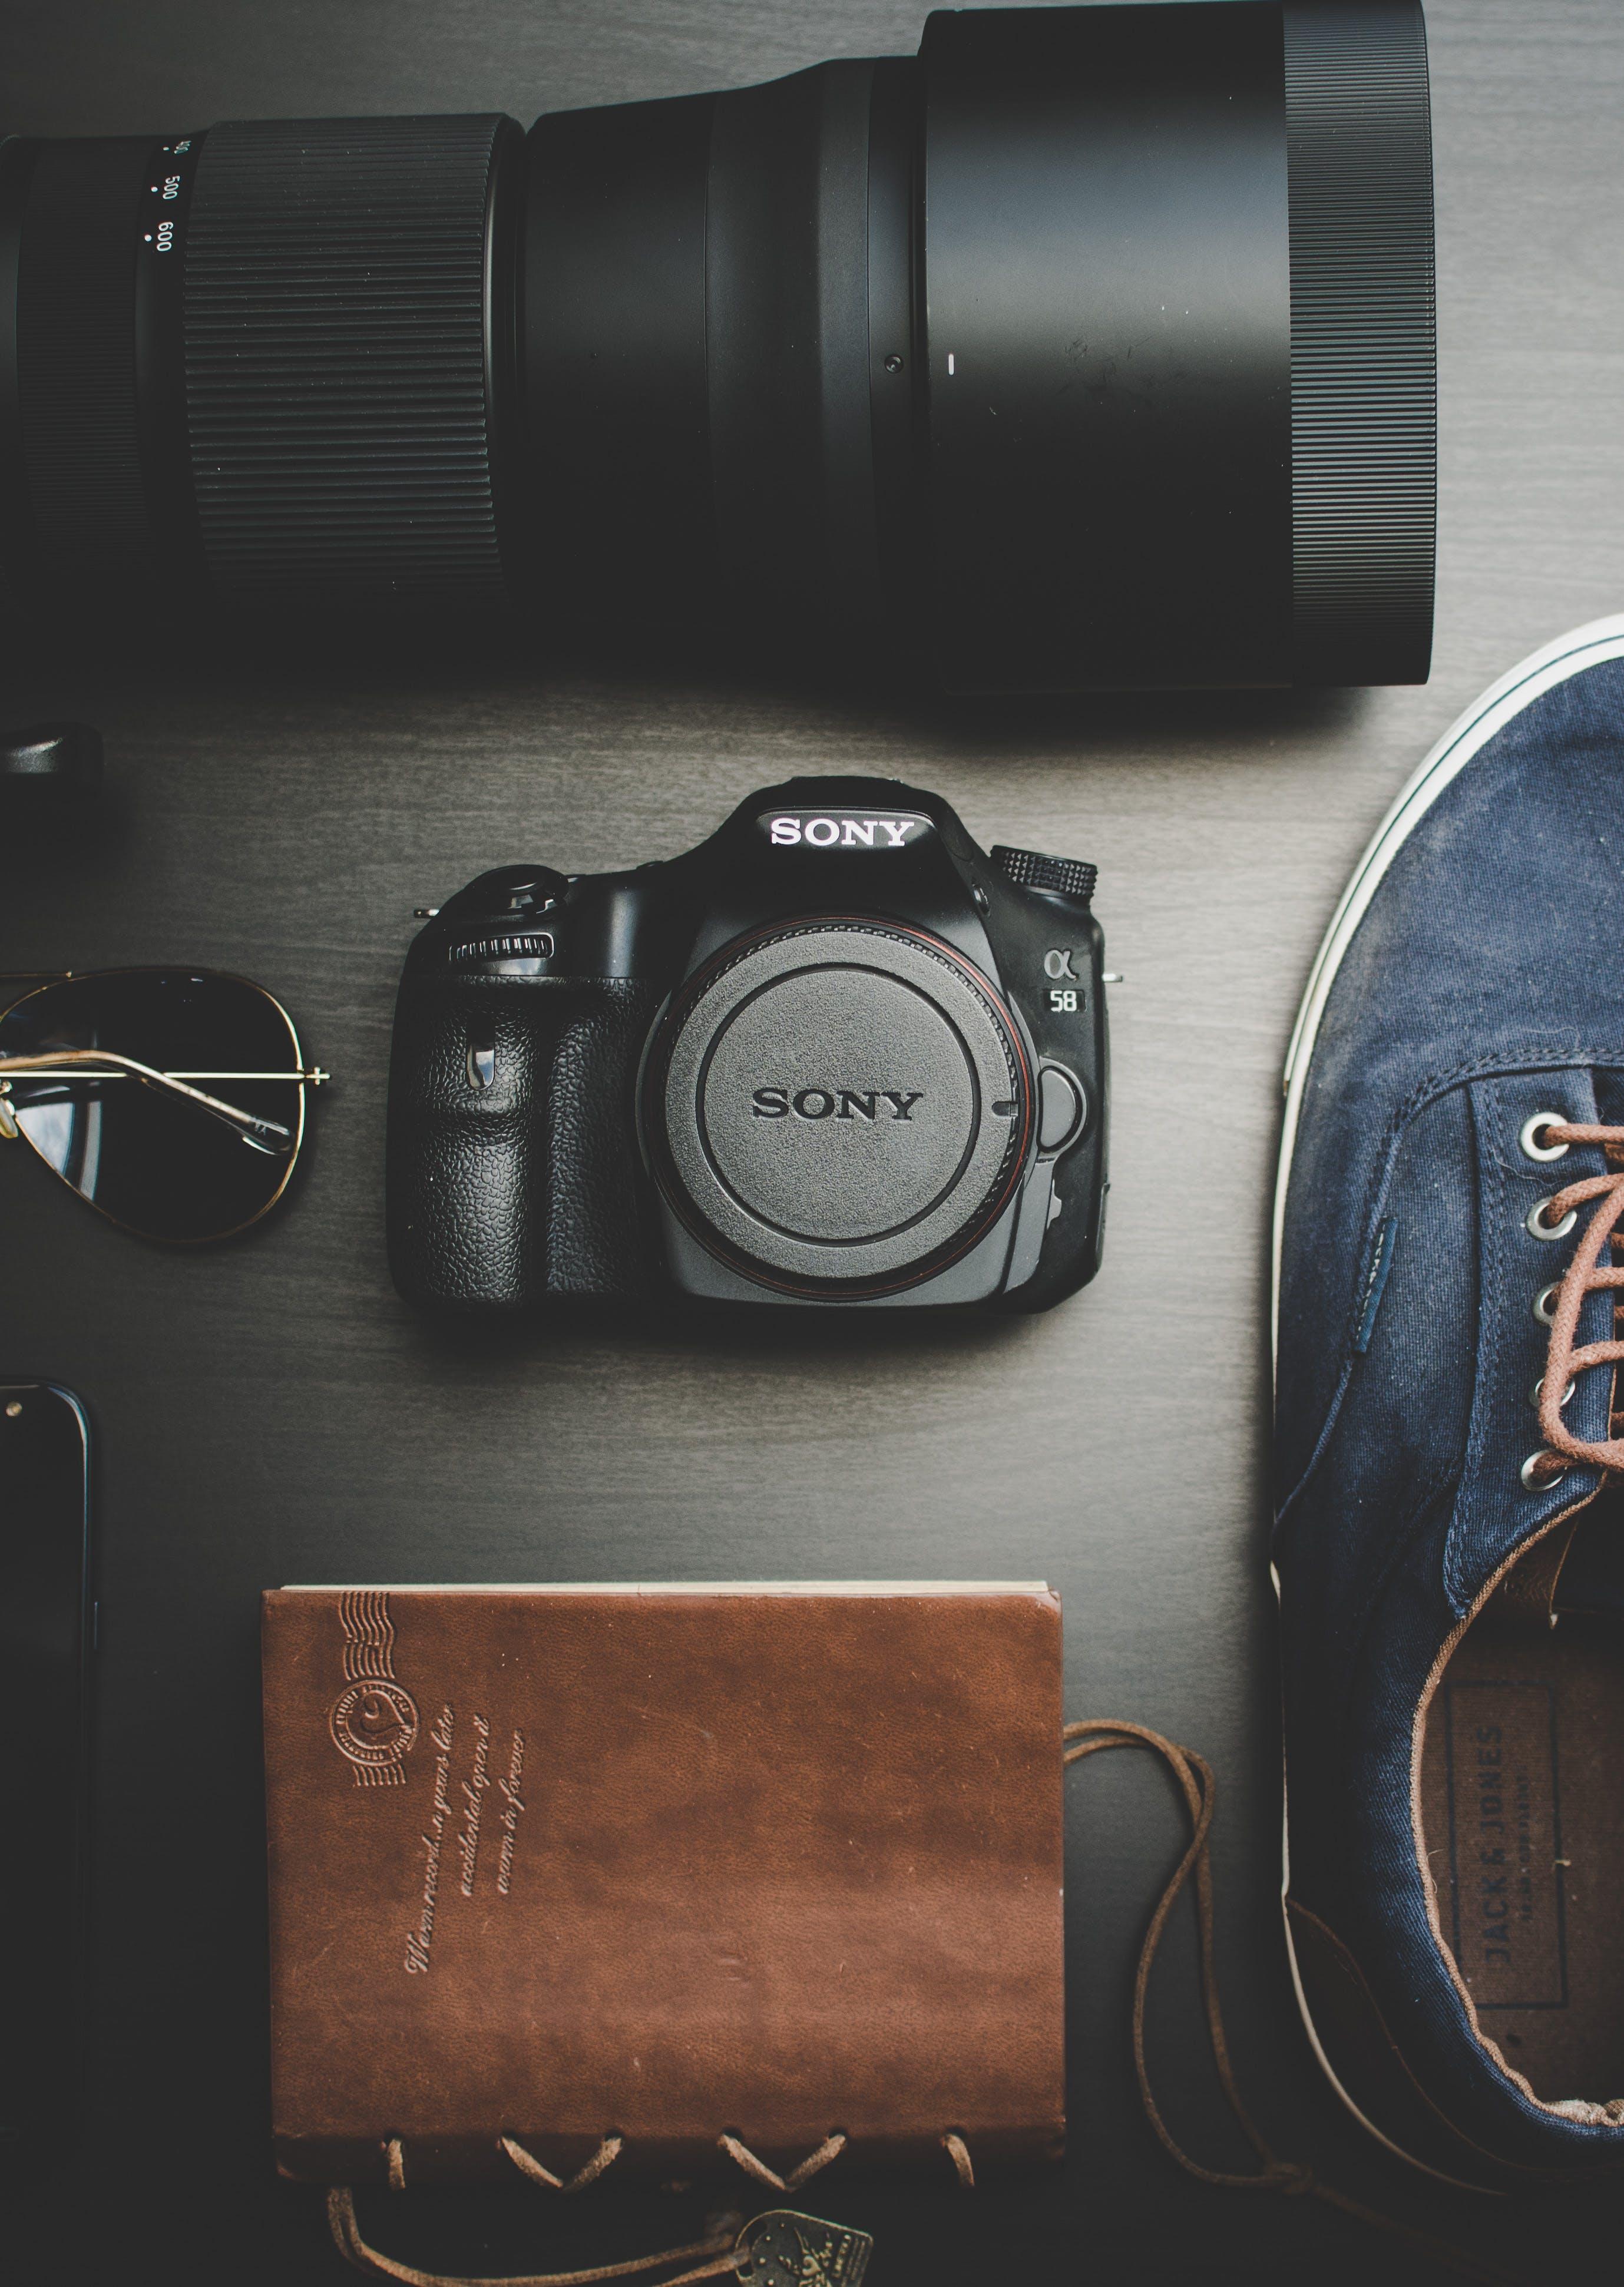 Black Sony Alpha Dslr Camera Body and Lens on Gray Surface